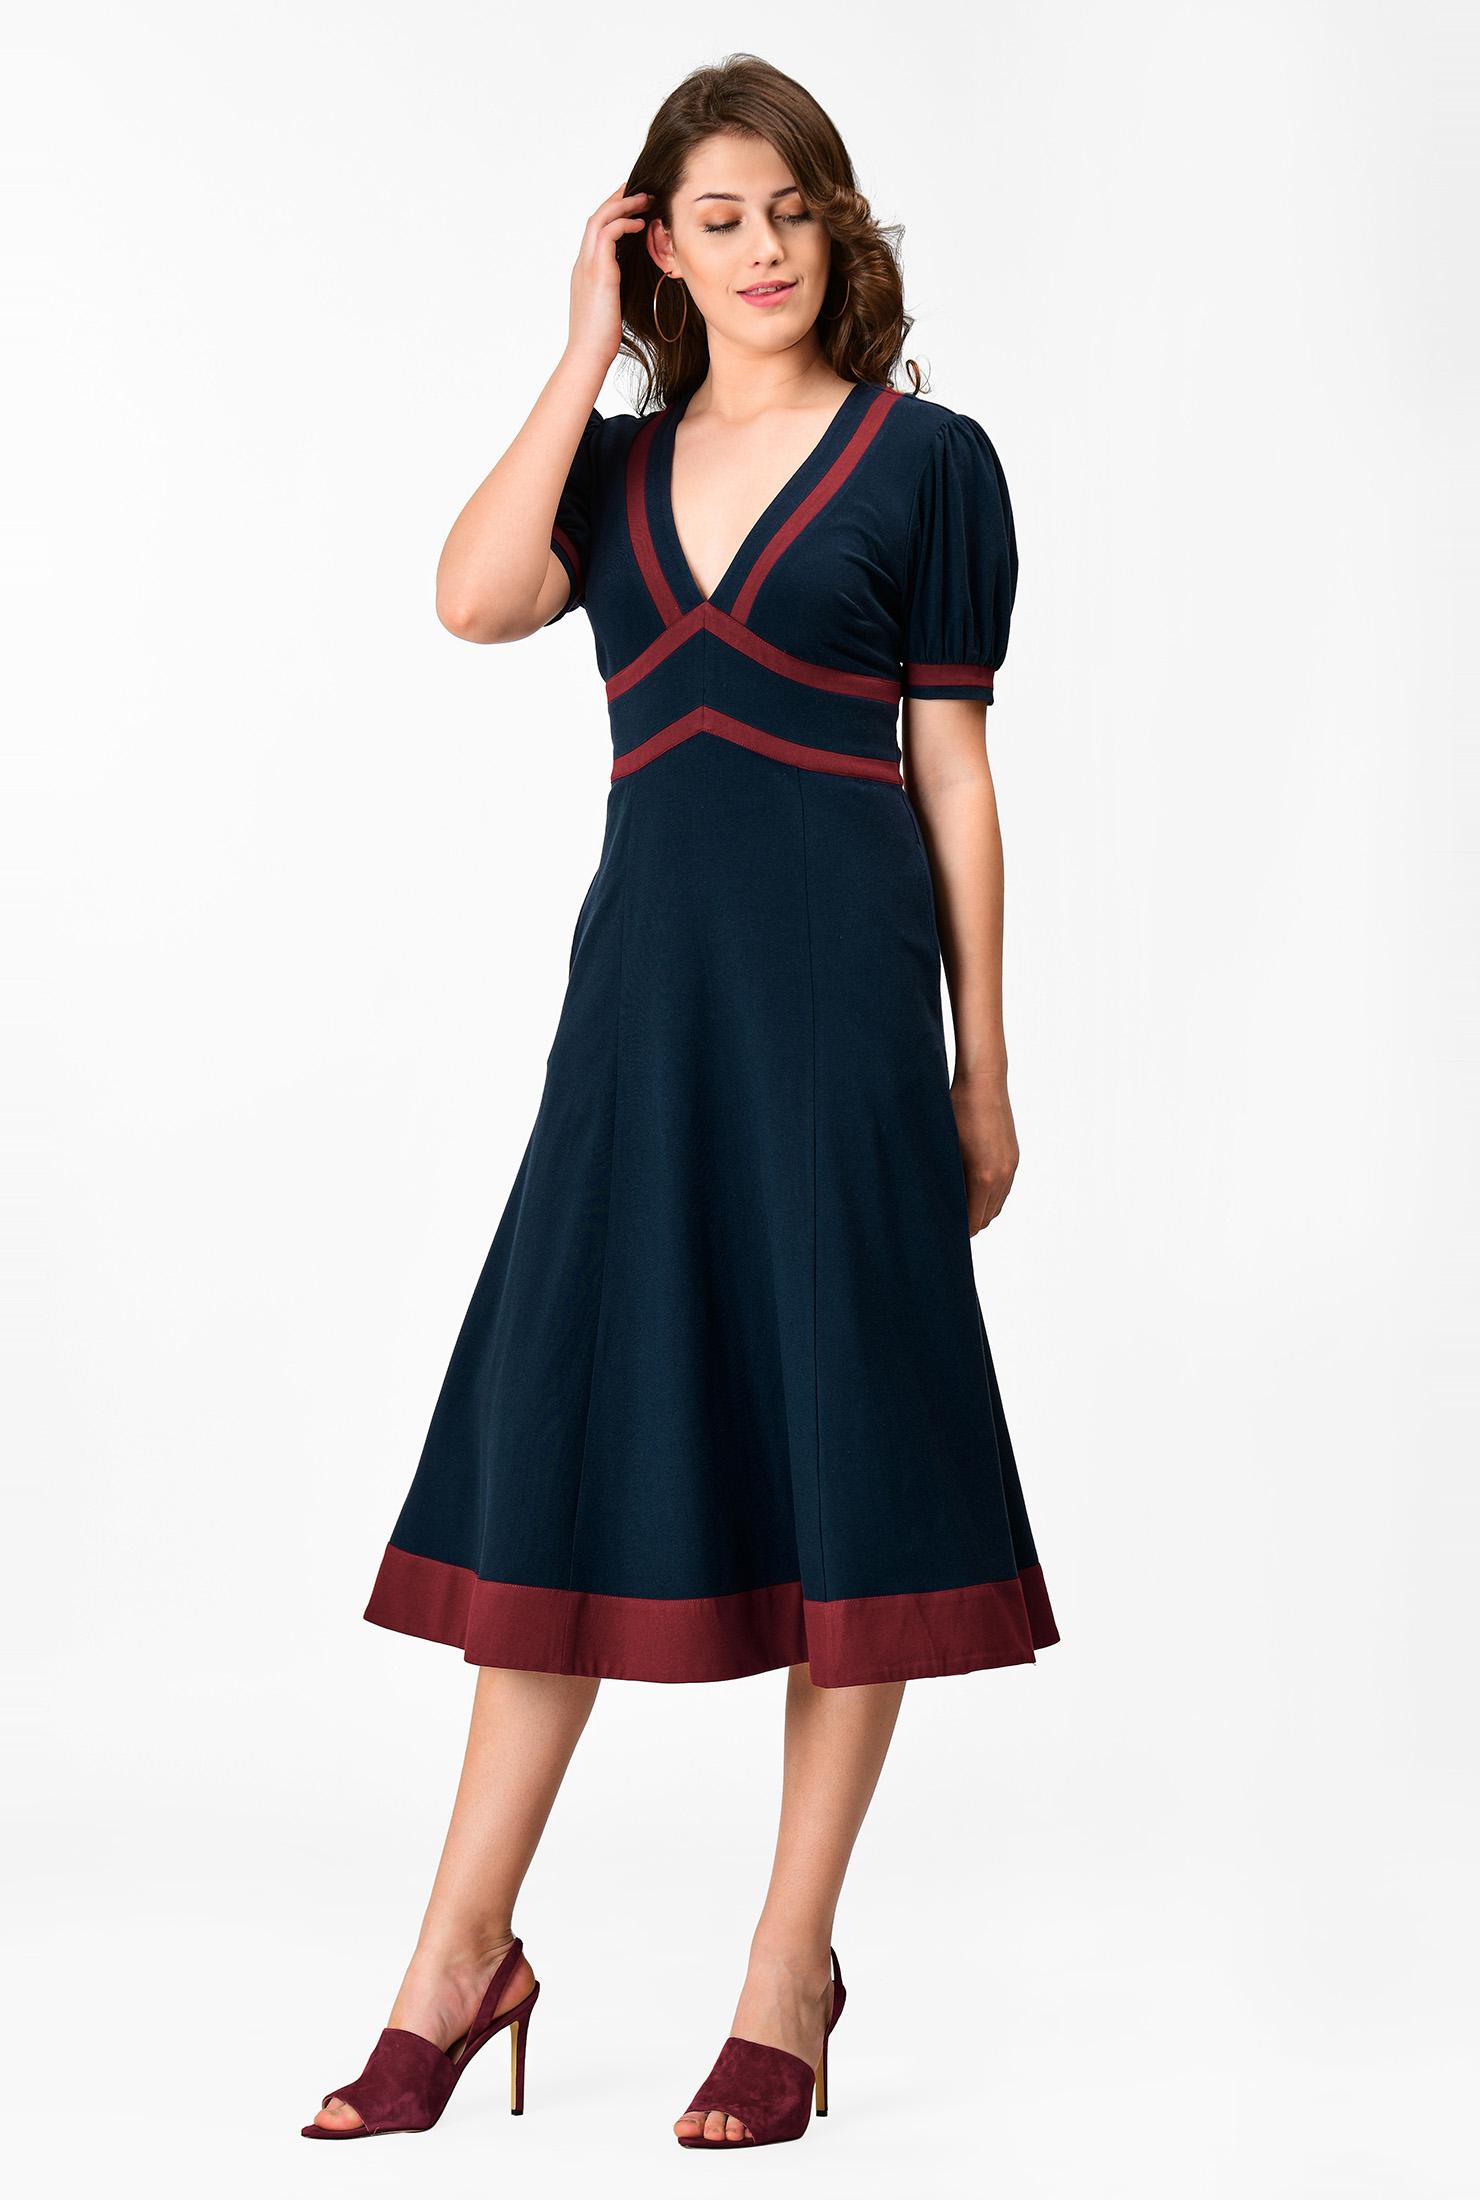 1930s Day Dresses, Afternoon Dresses History Cotton knit contrast trim empire dress $64.95 AT vintagedancer.com